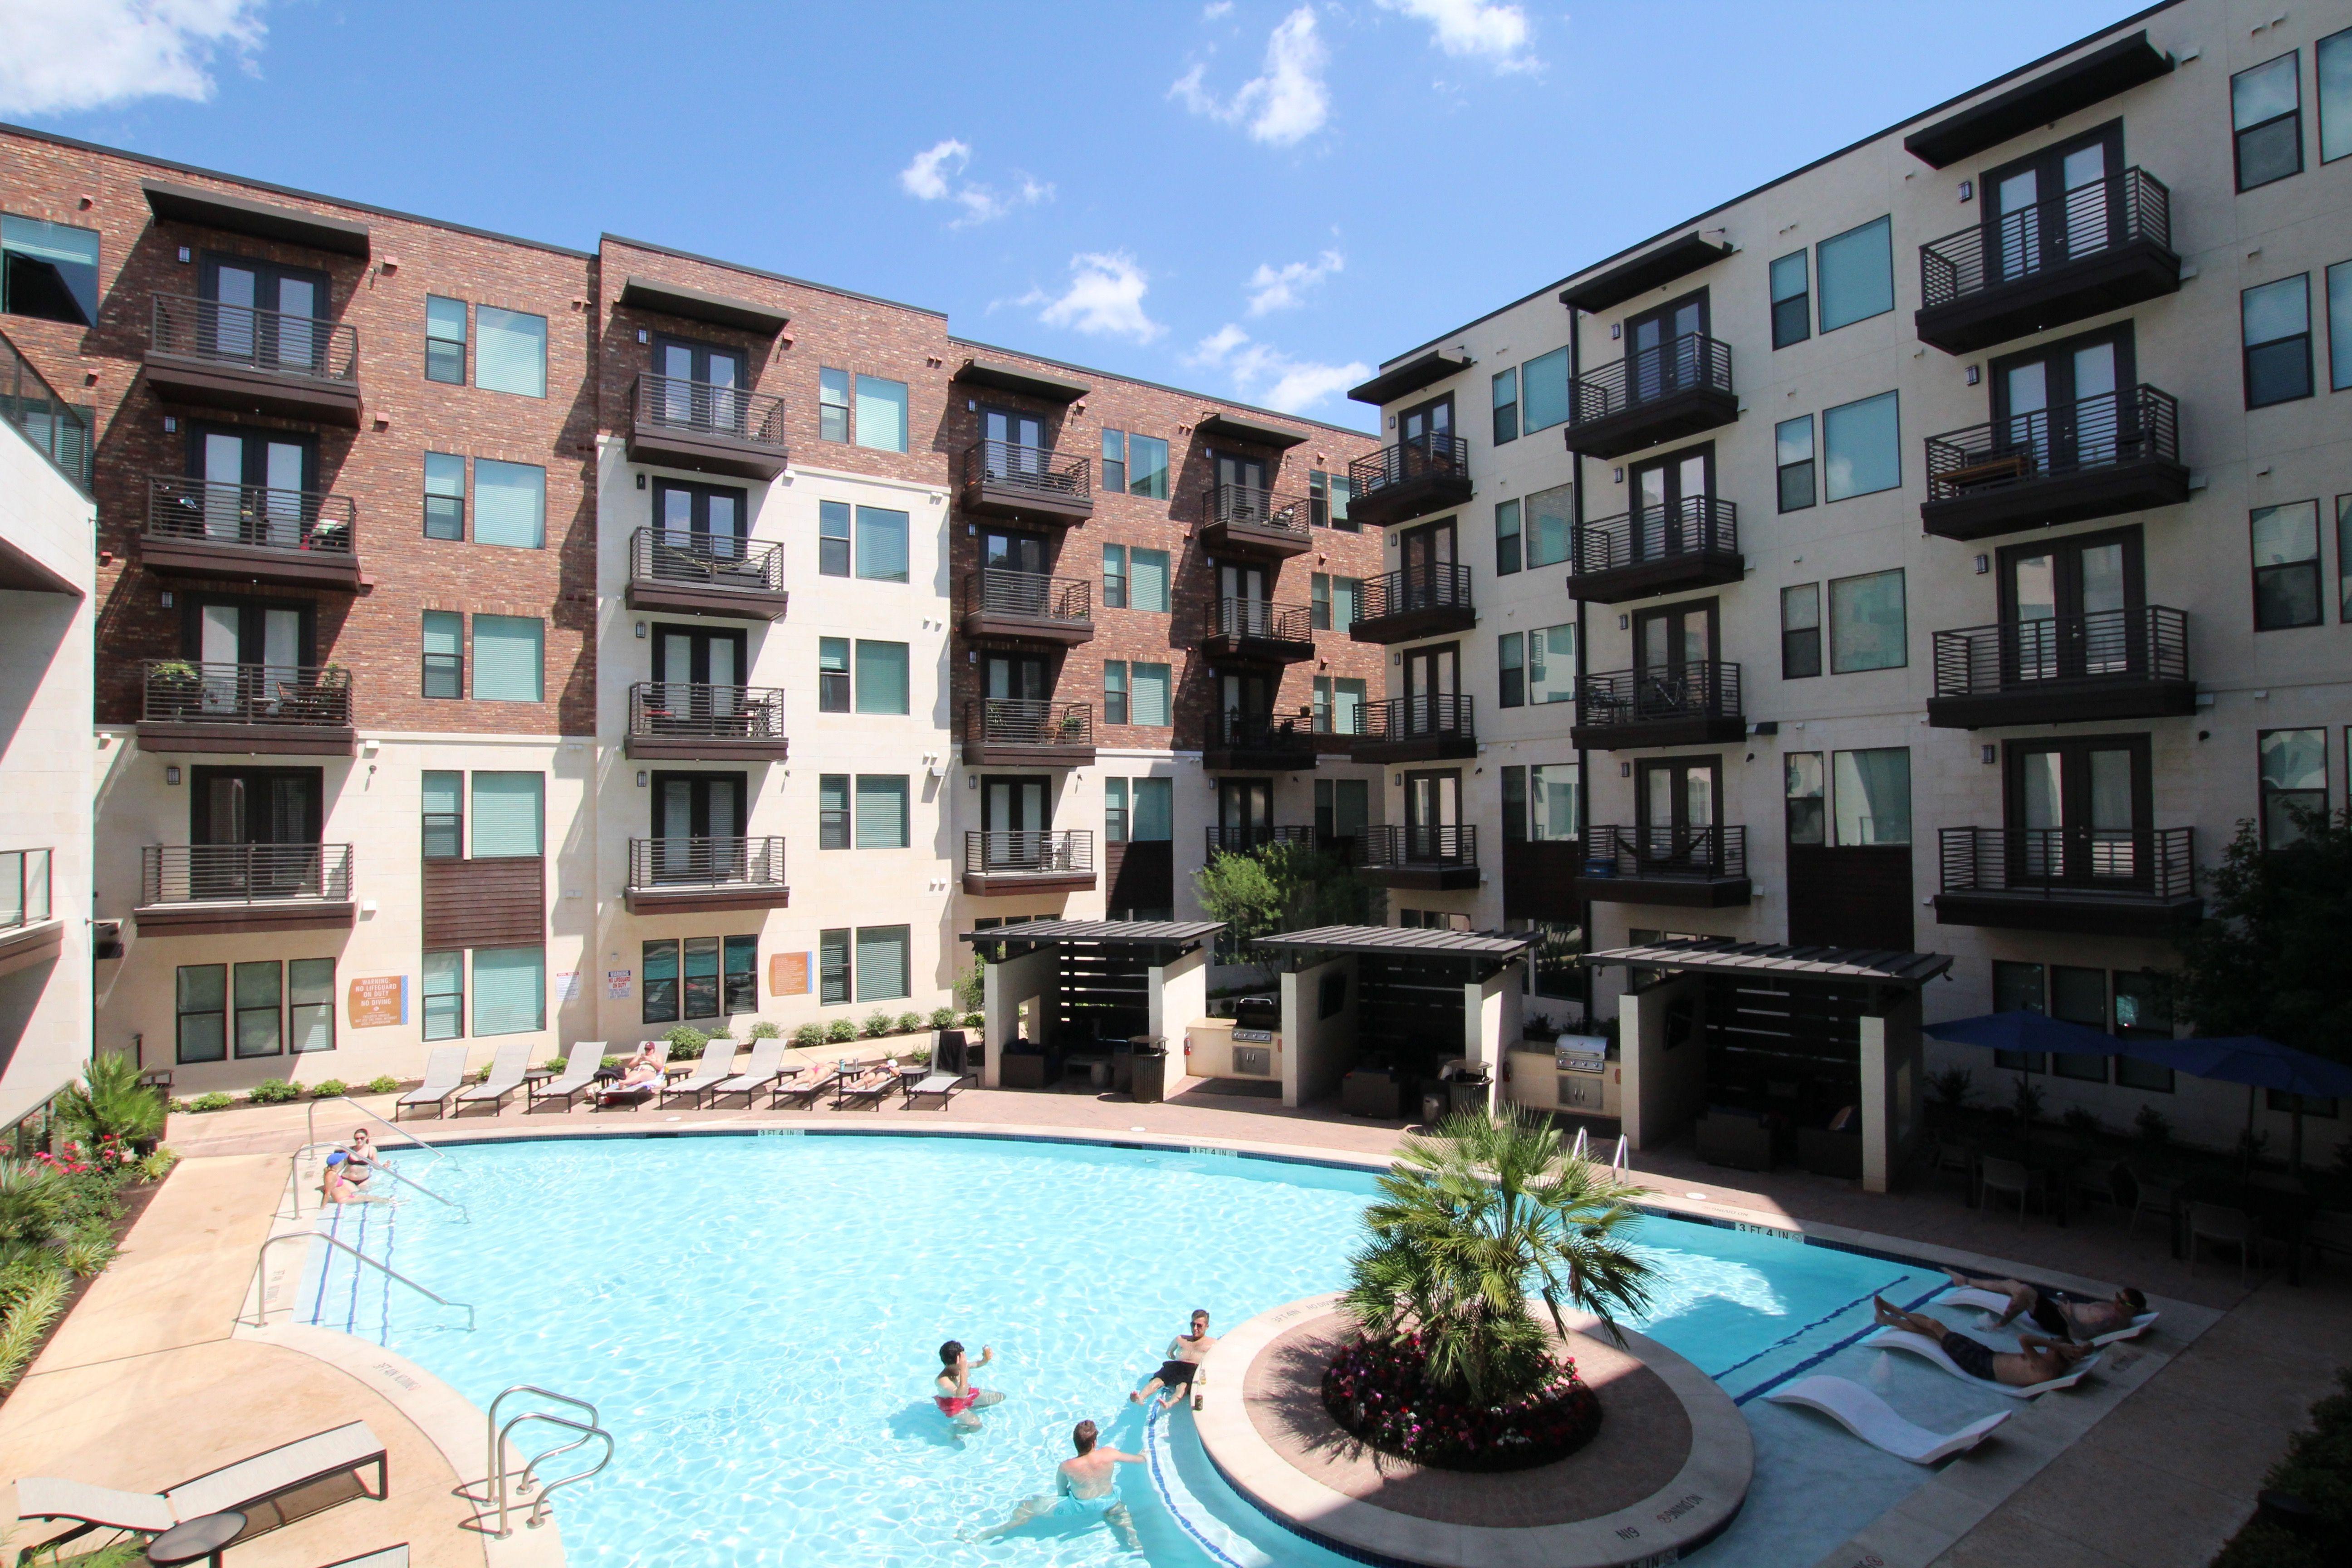 Austin Texas East Riverside living. Apartment locator